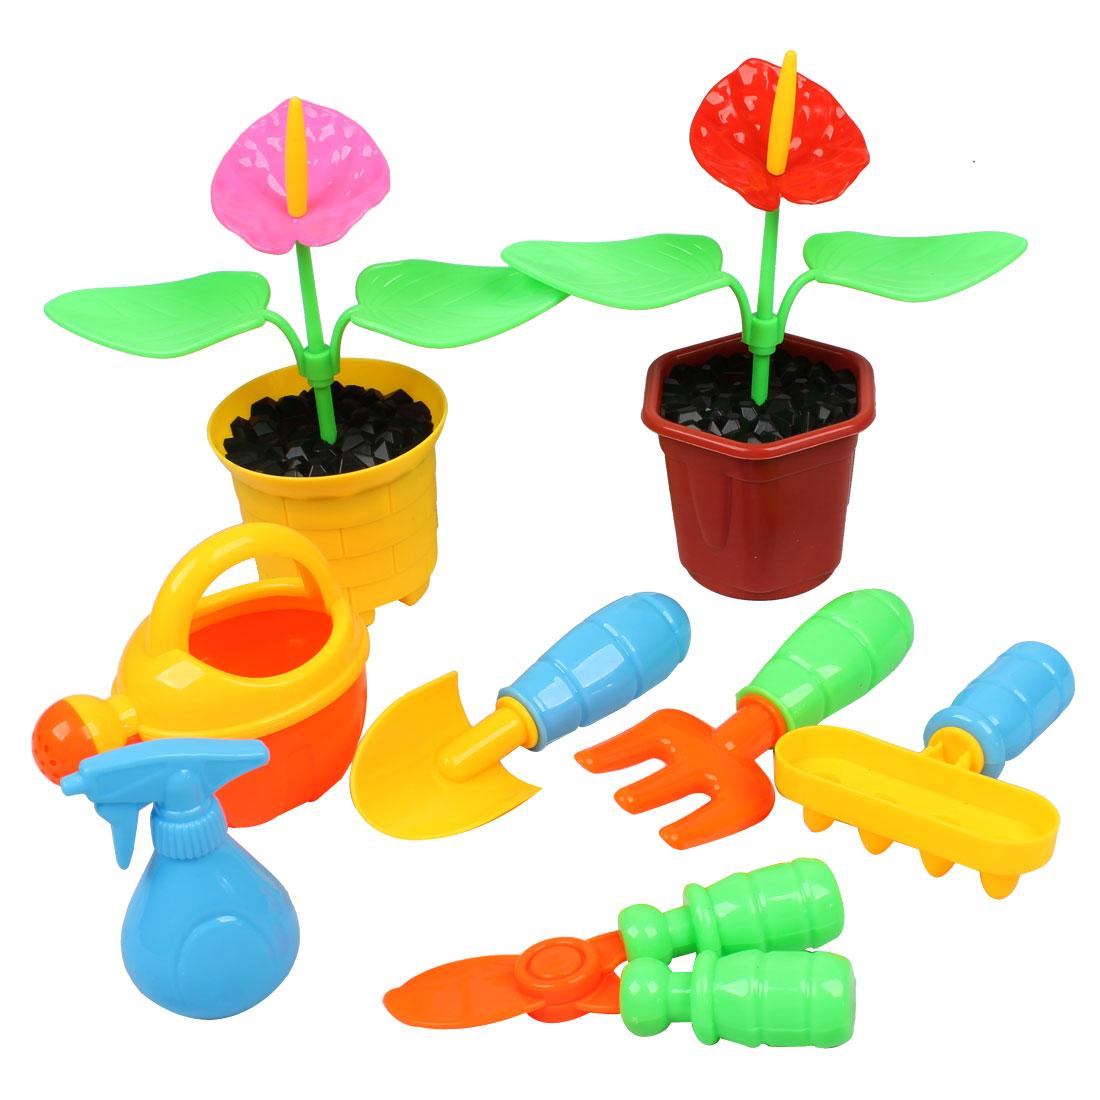 Kids Colorful Pot Culture Scissors Rake Scoop Spray Bottle Grow Flower Toy Set 8 in 1